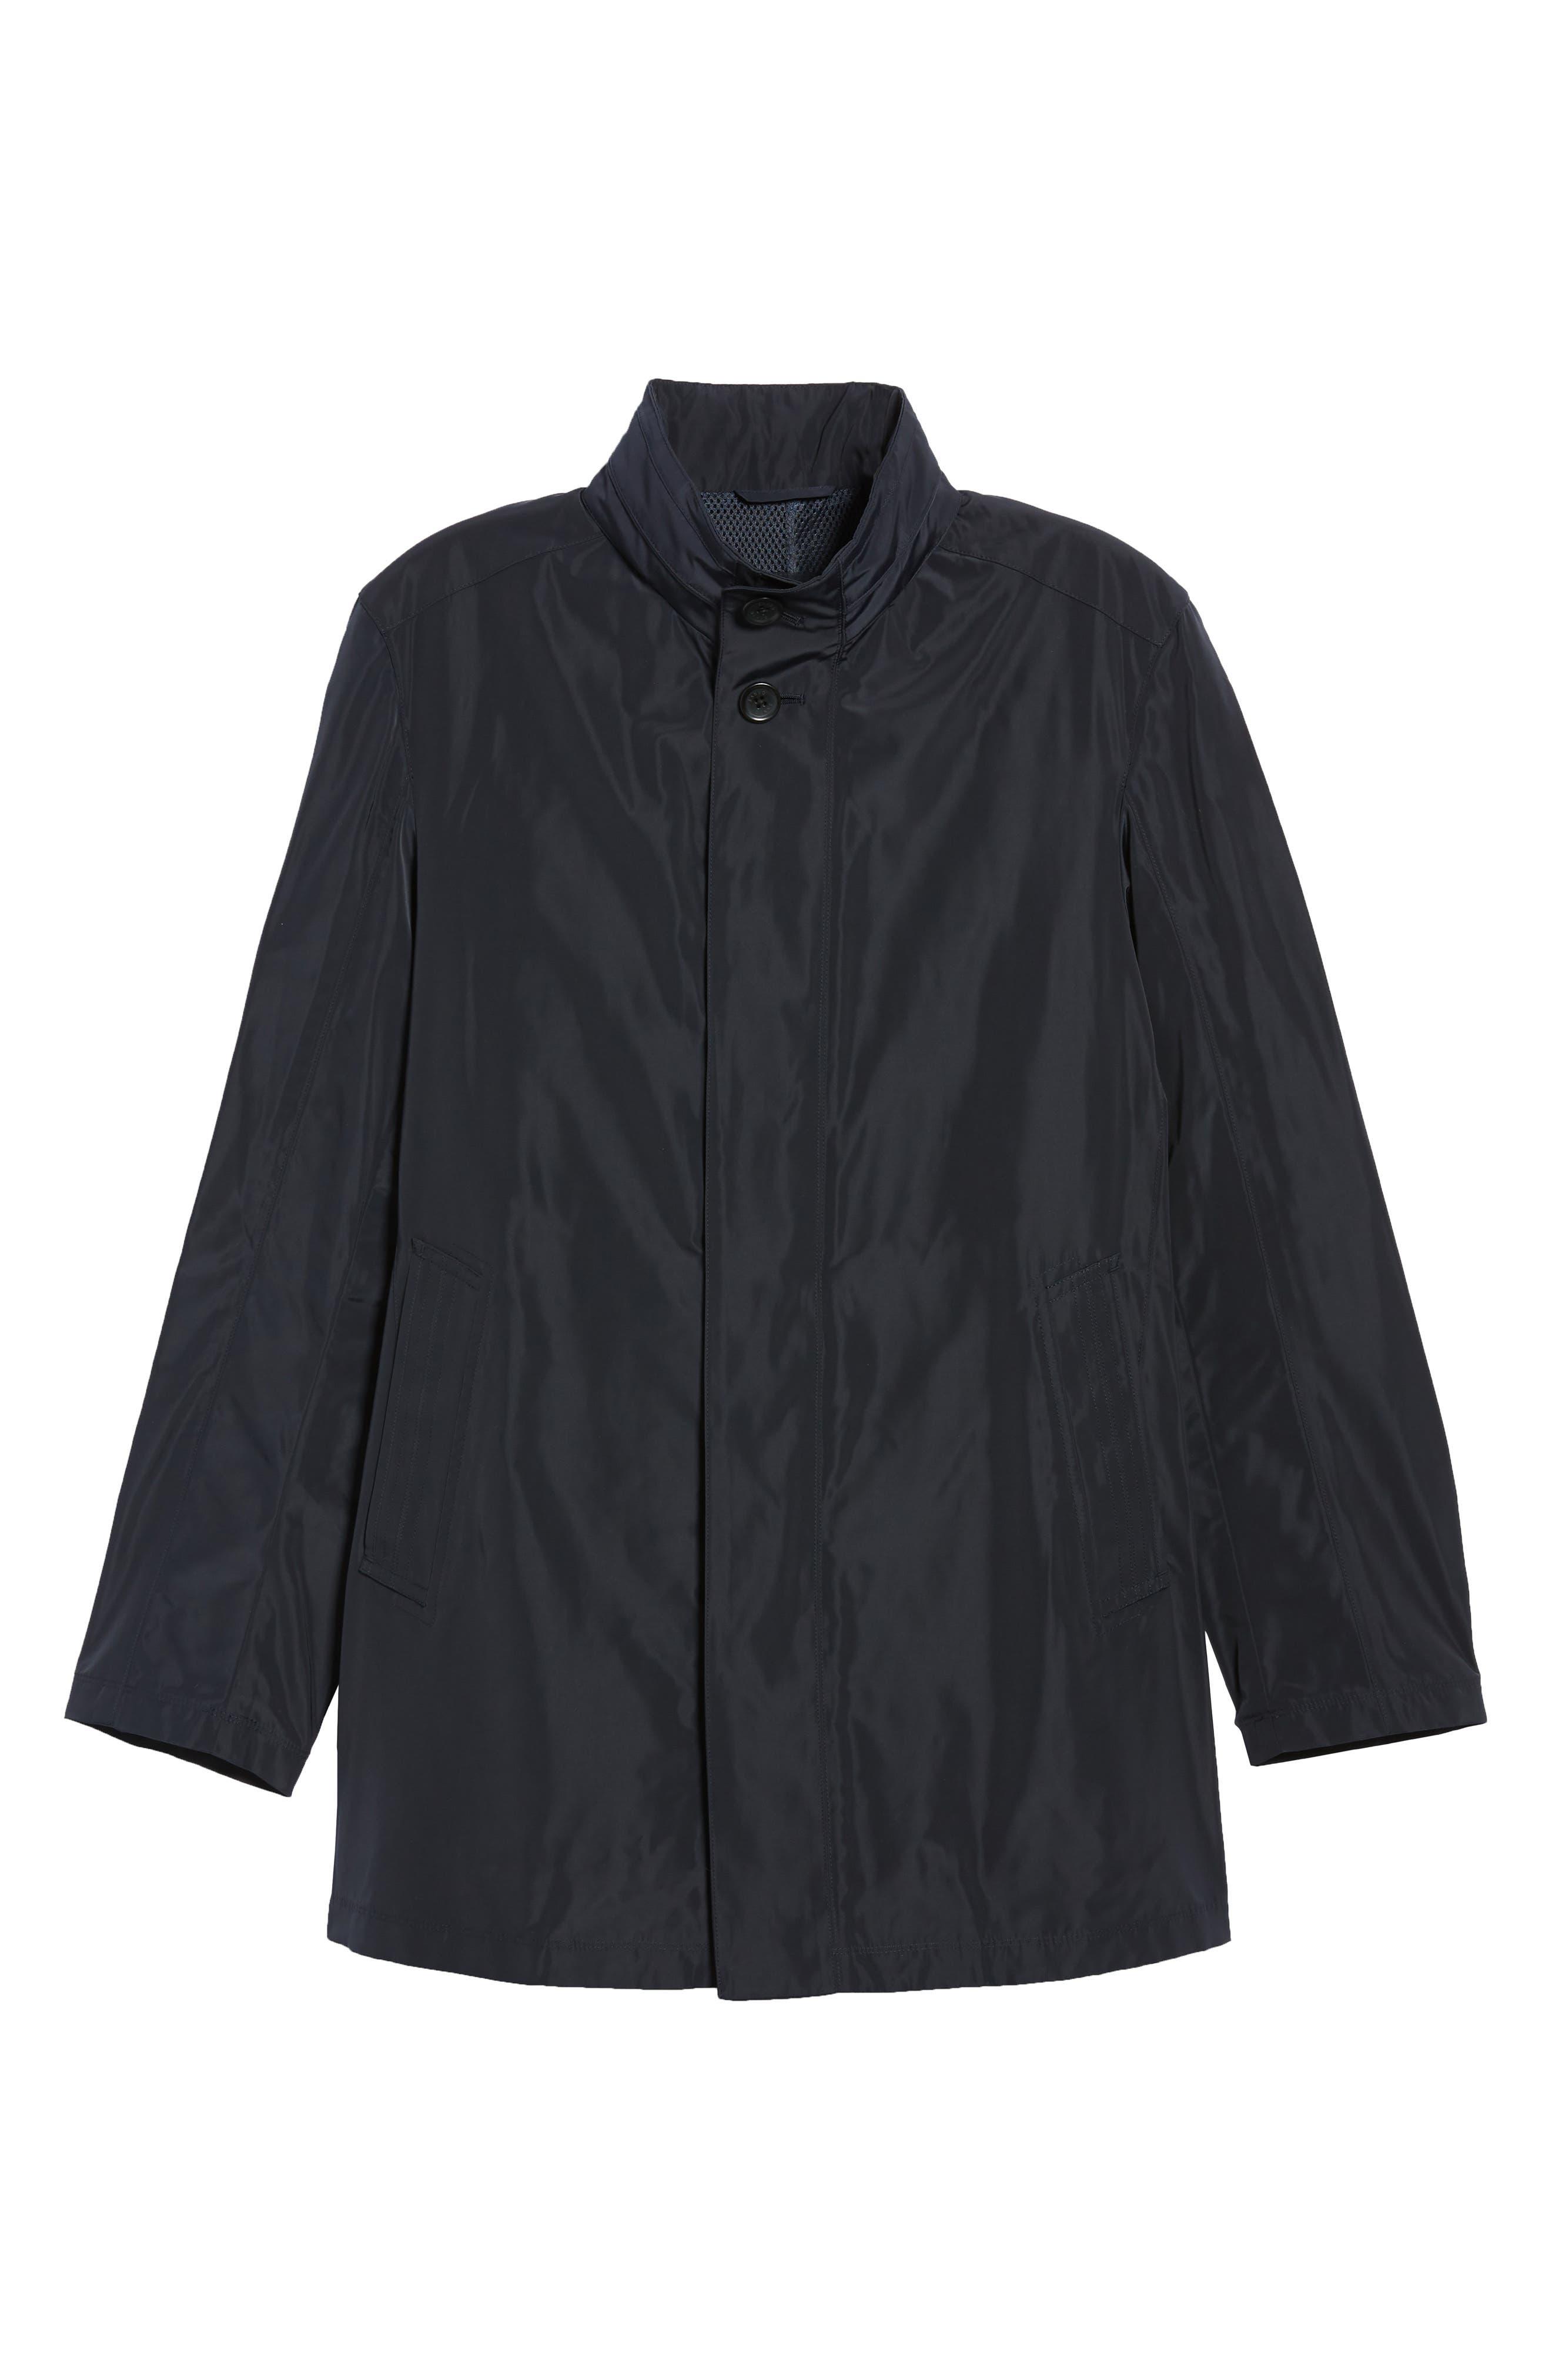 Getaway Raincoat,                         Main,                         color, Midnight